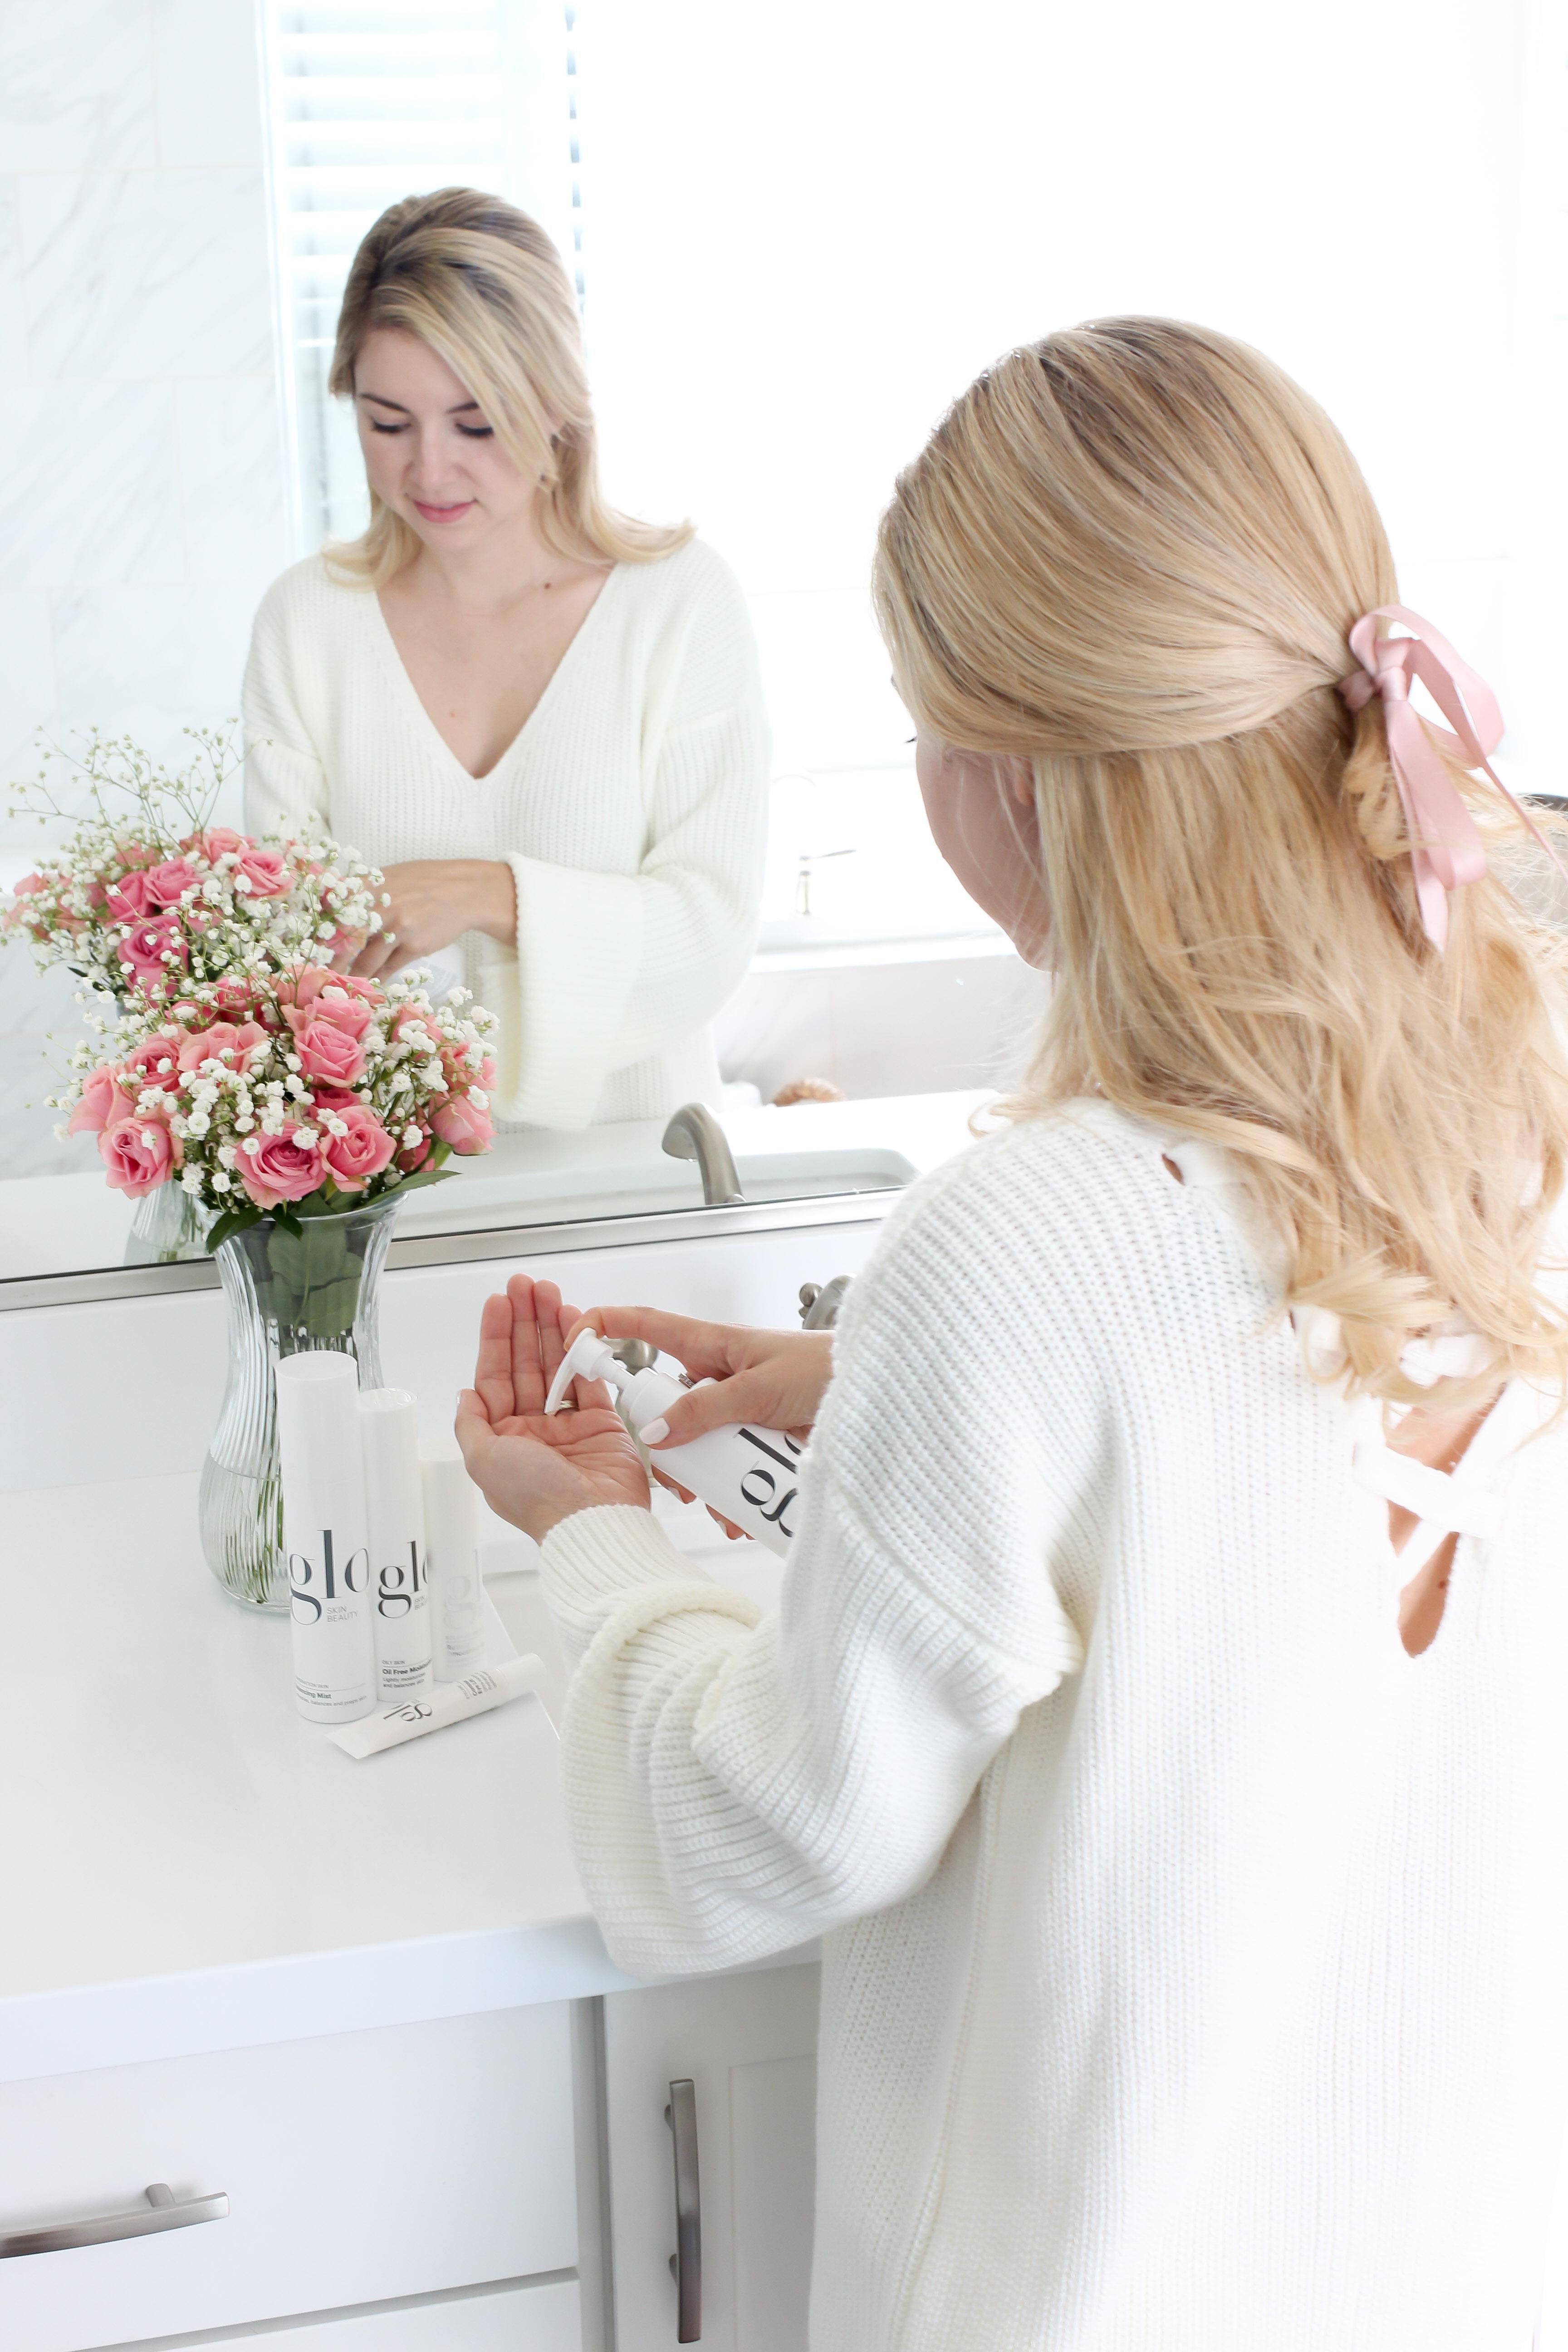 Simply Sutter Glo Skin Beauty Makeup Beauty Skincare6472